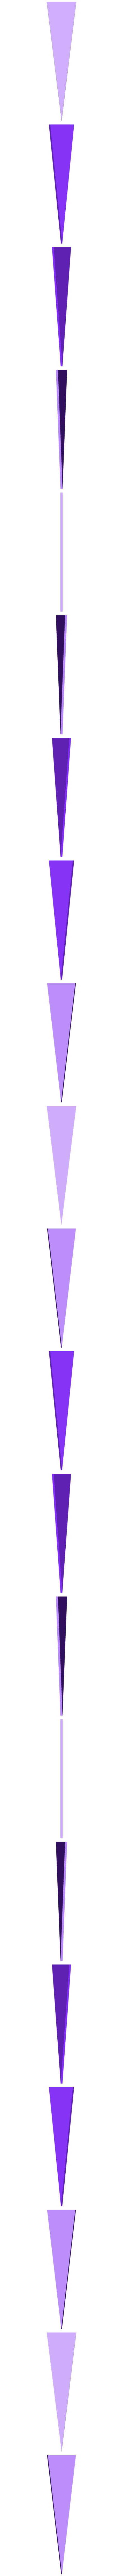 triangle.stl Download STL file Backgammon game • 3D print template, eliza_sparrow